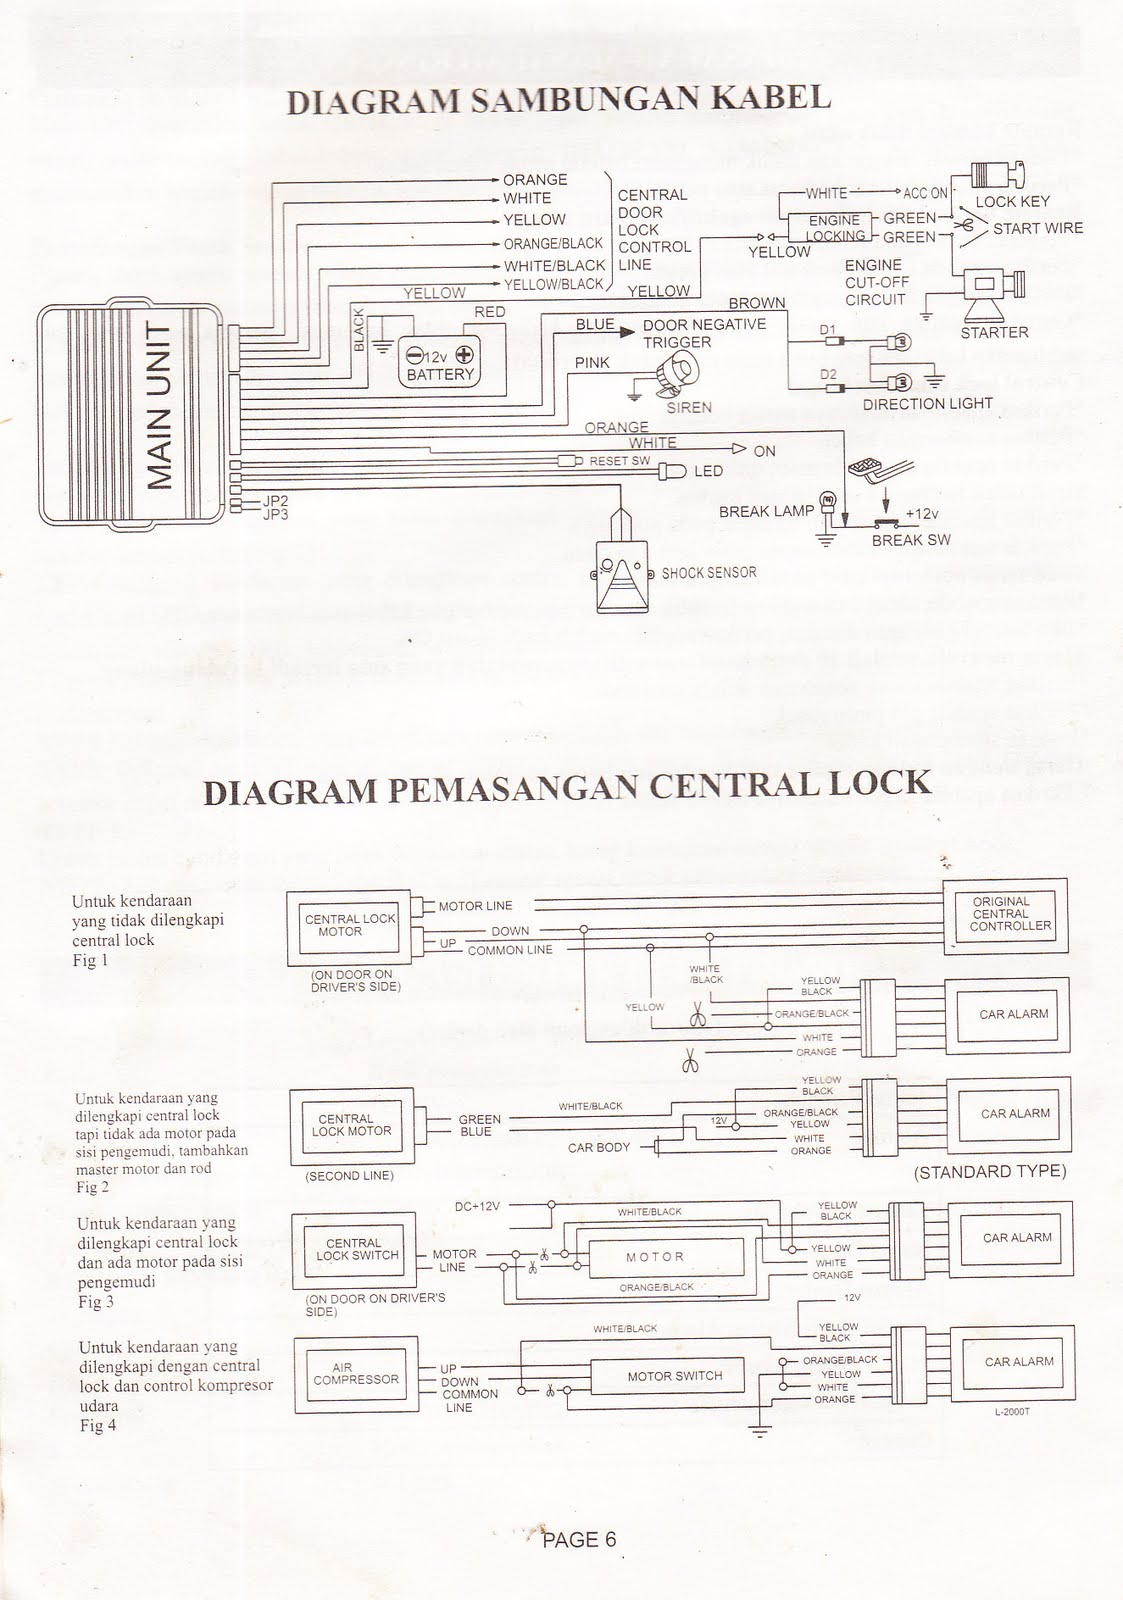 Enchanting car alarm system wiring diagram picture collection wiring diagram alarm mobil wiring diagrams swarovskicordoba Choice Image